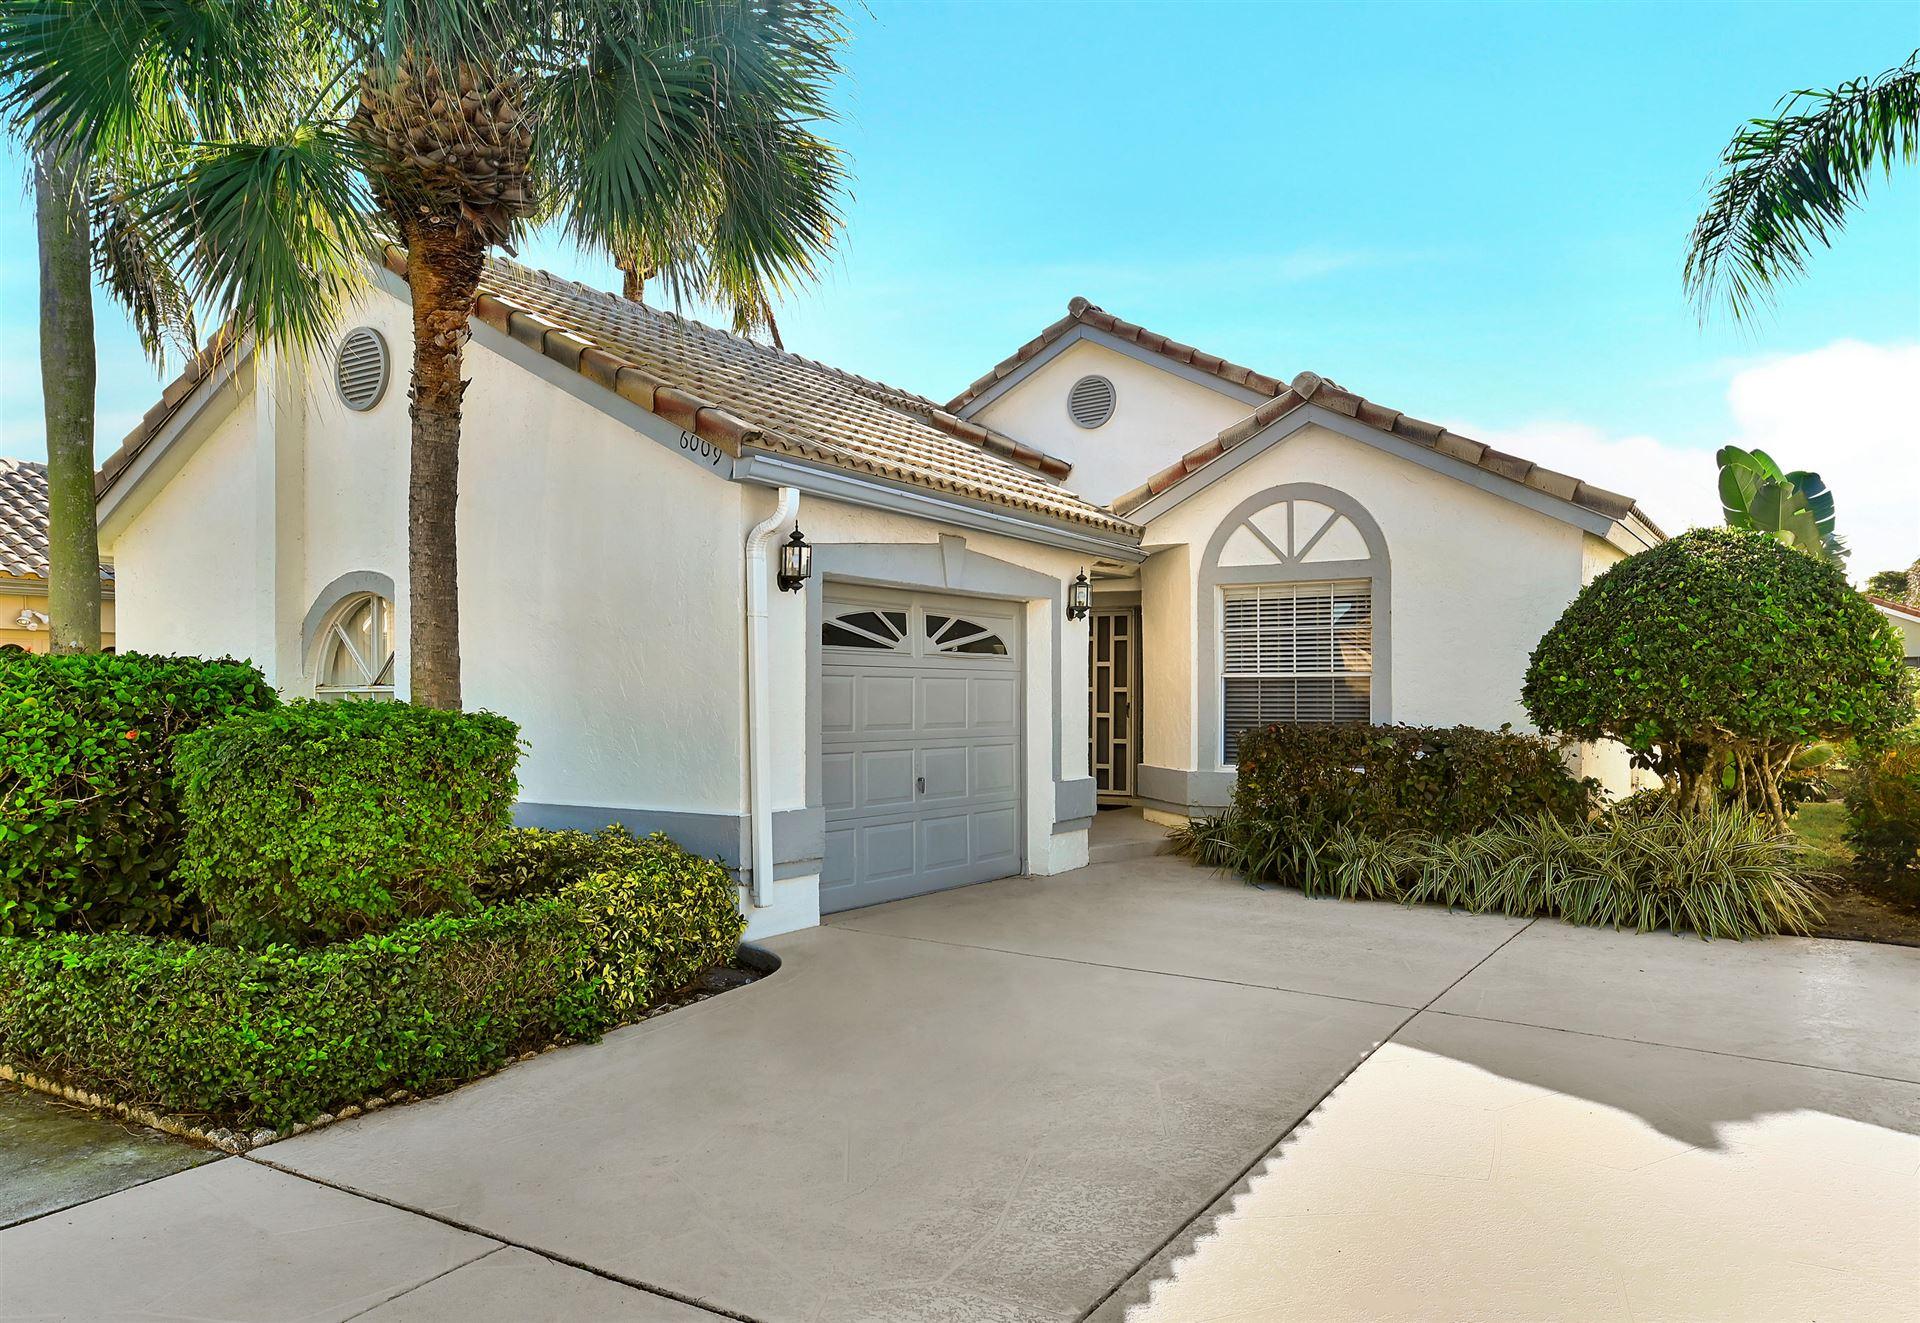 6009 Bay Isles Drive, Boynton Beach, FL 33437 - #: RX-10674282